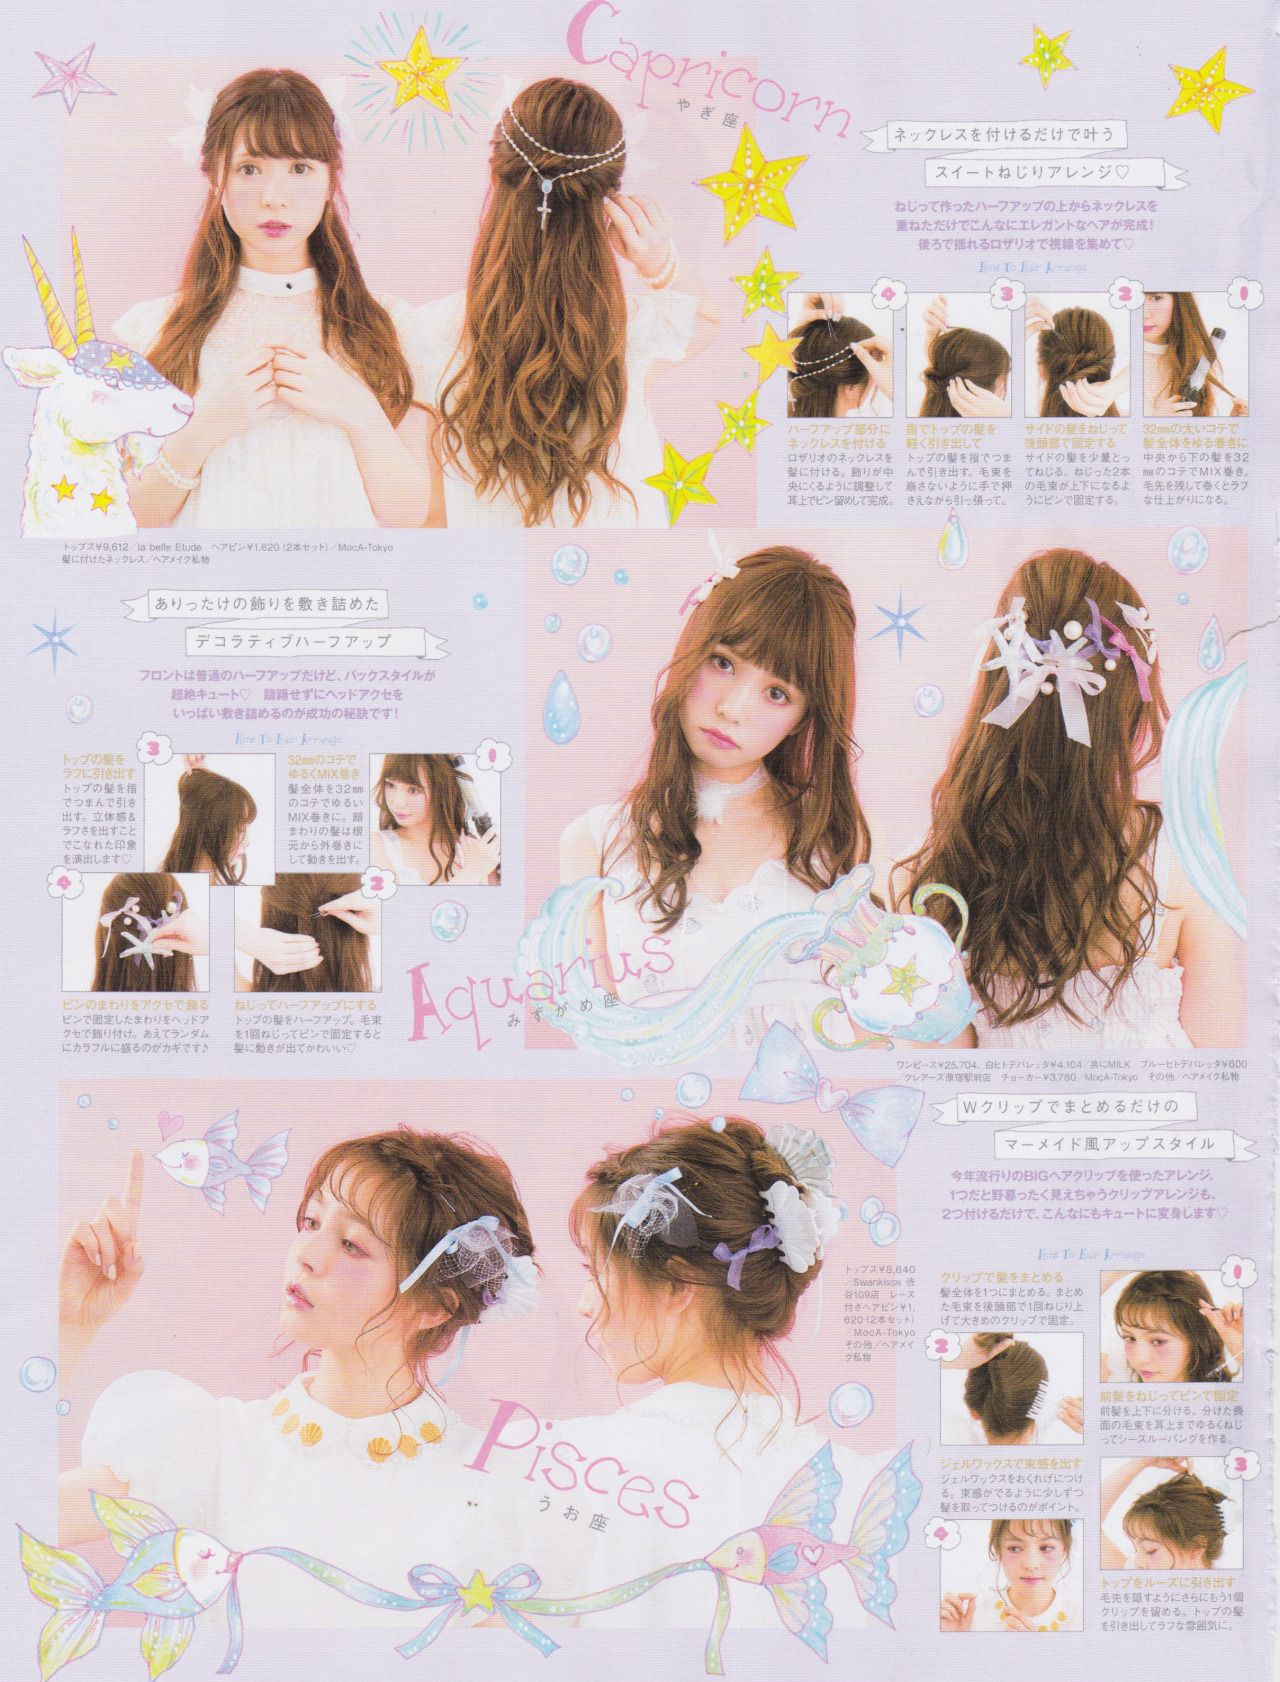 tumblr_o86fqvn6Uz1vw7lgqo3_1280.jpg (1280×1682)   Creative hairstyles, Kawaii  hairstyles, Hair styles